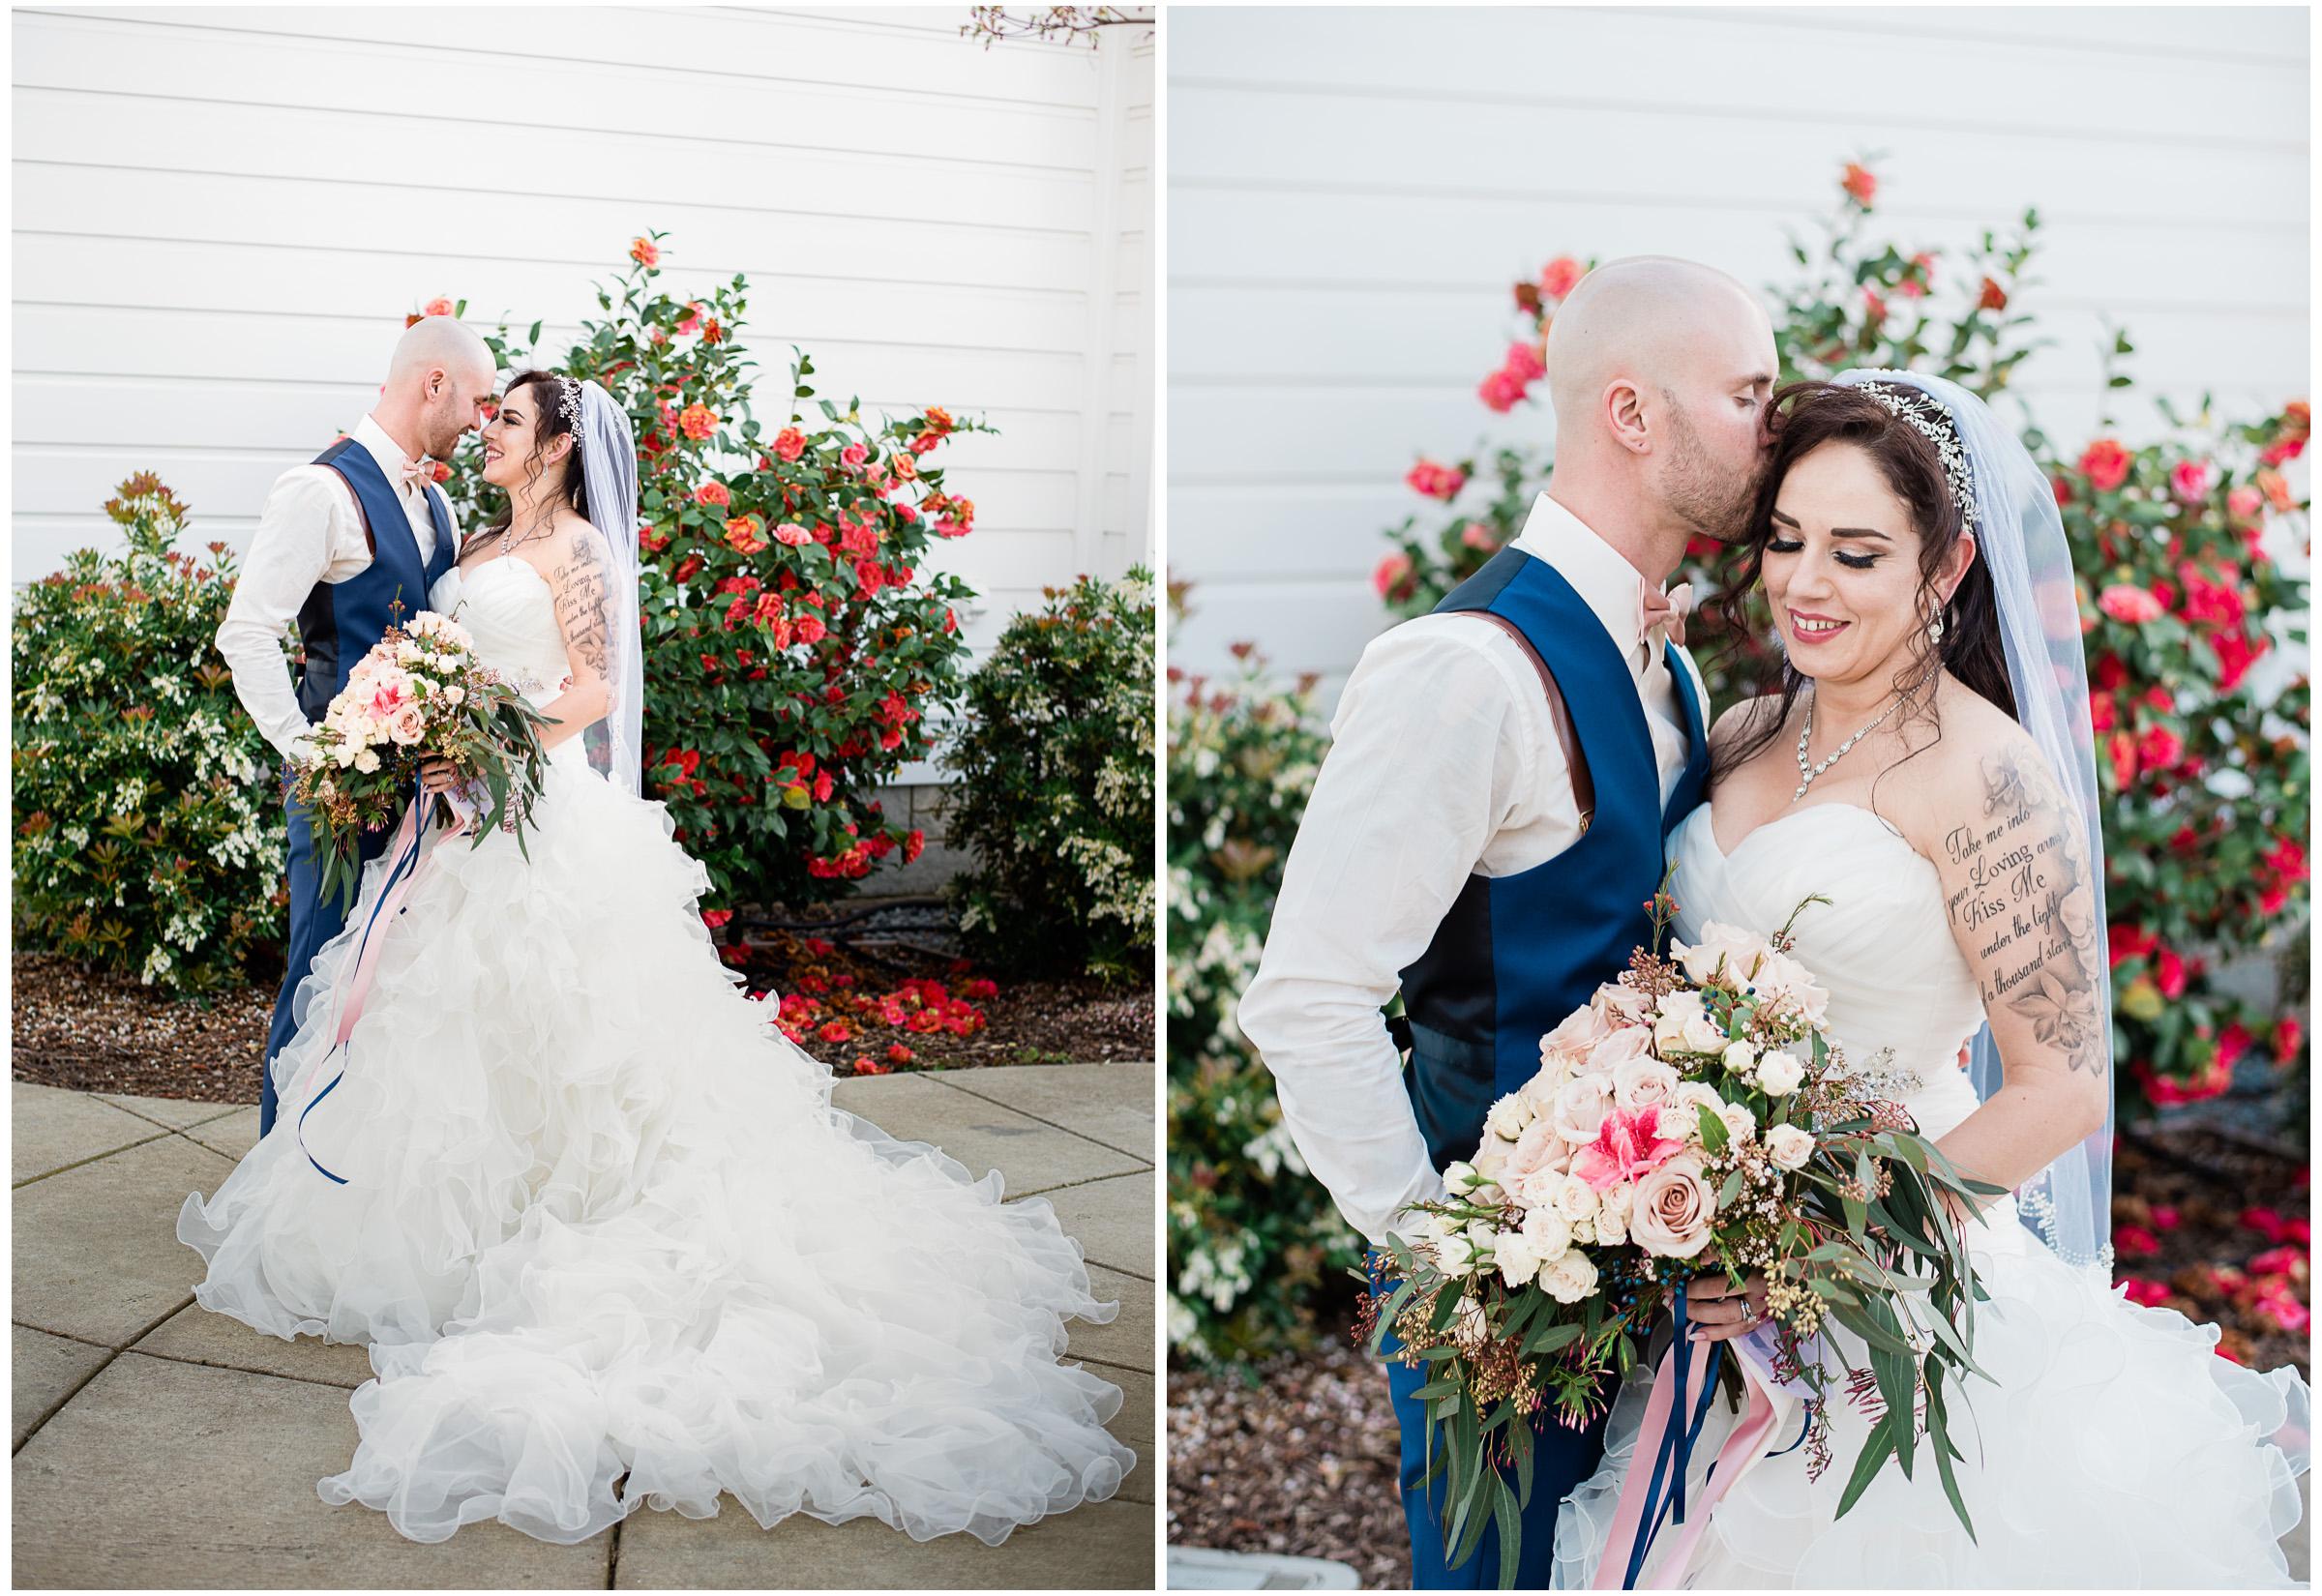 Sacramento Wedding - Sacramento Photographer - Justin Wilcox Photography - 18.jpg